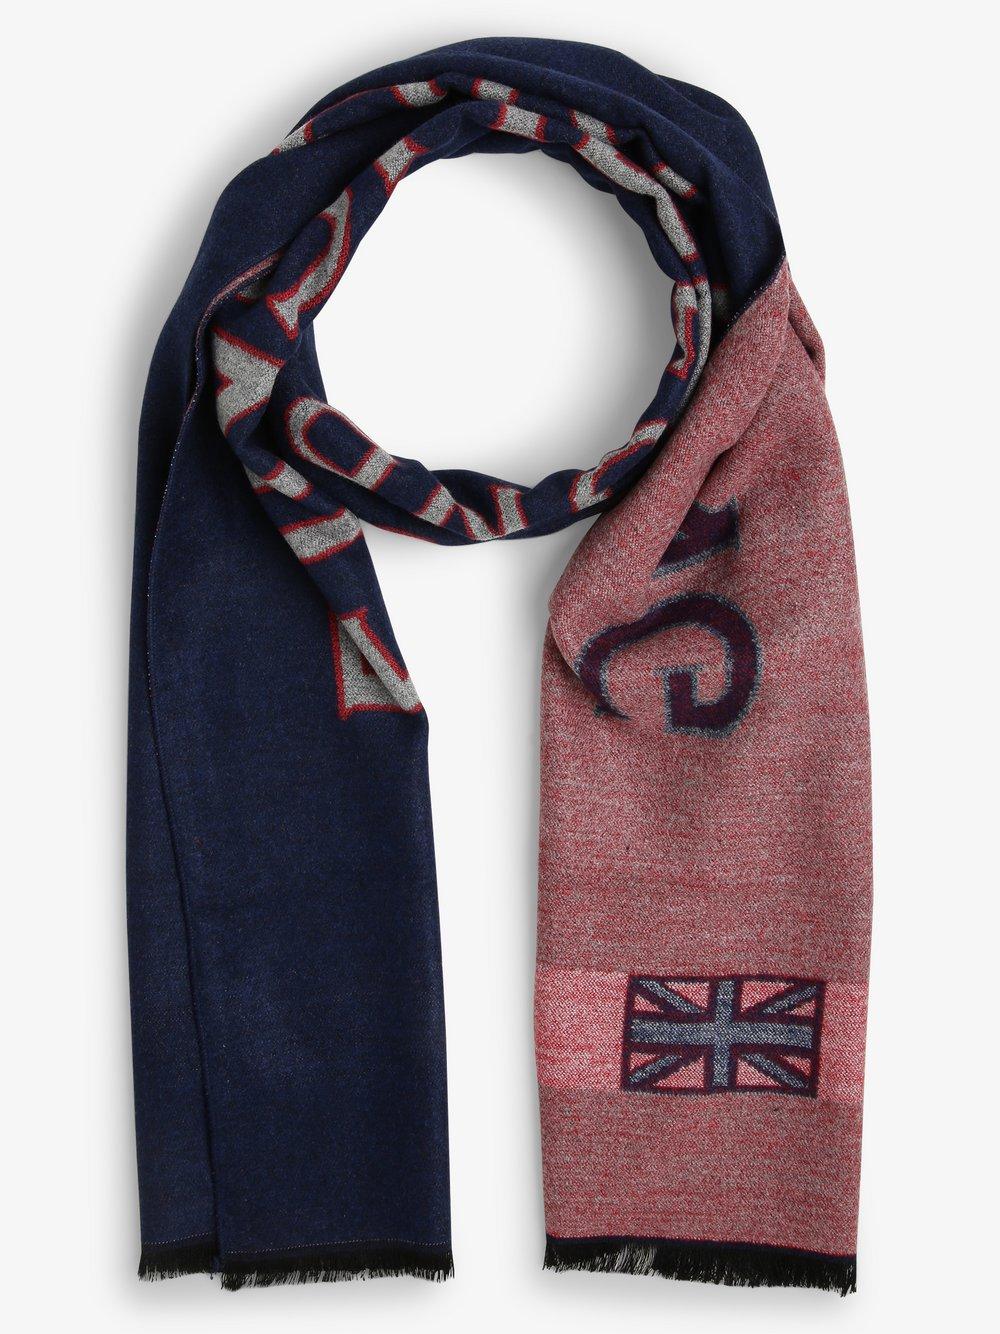 Finshley & Harding London – Szalik męski, niebieski Van Graaf 487389-0001